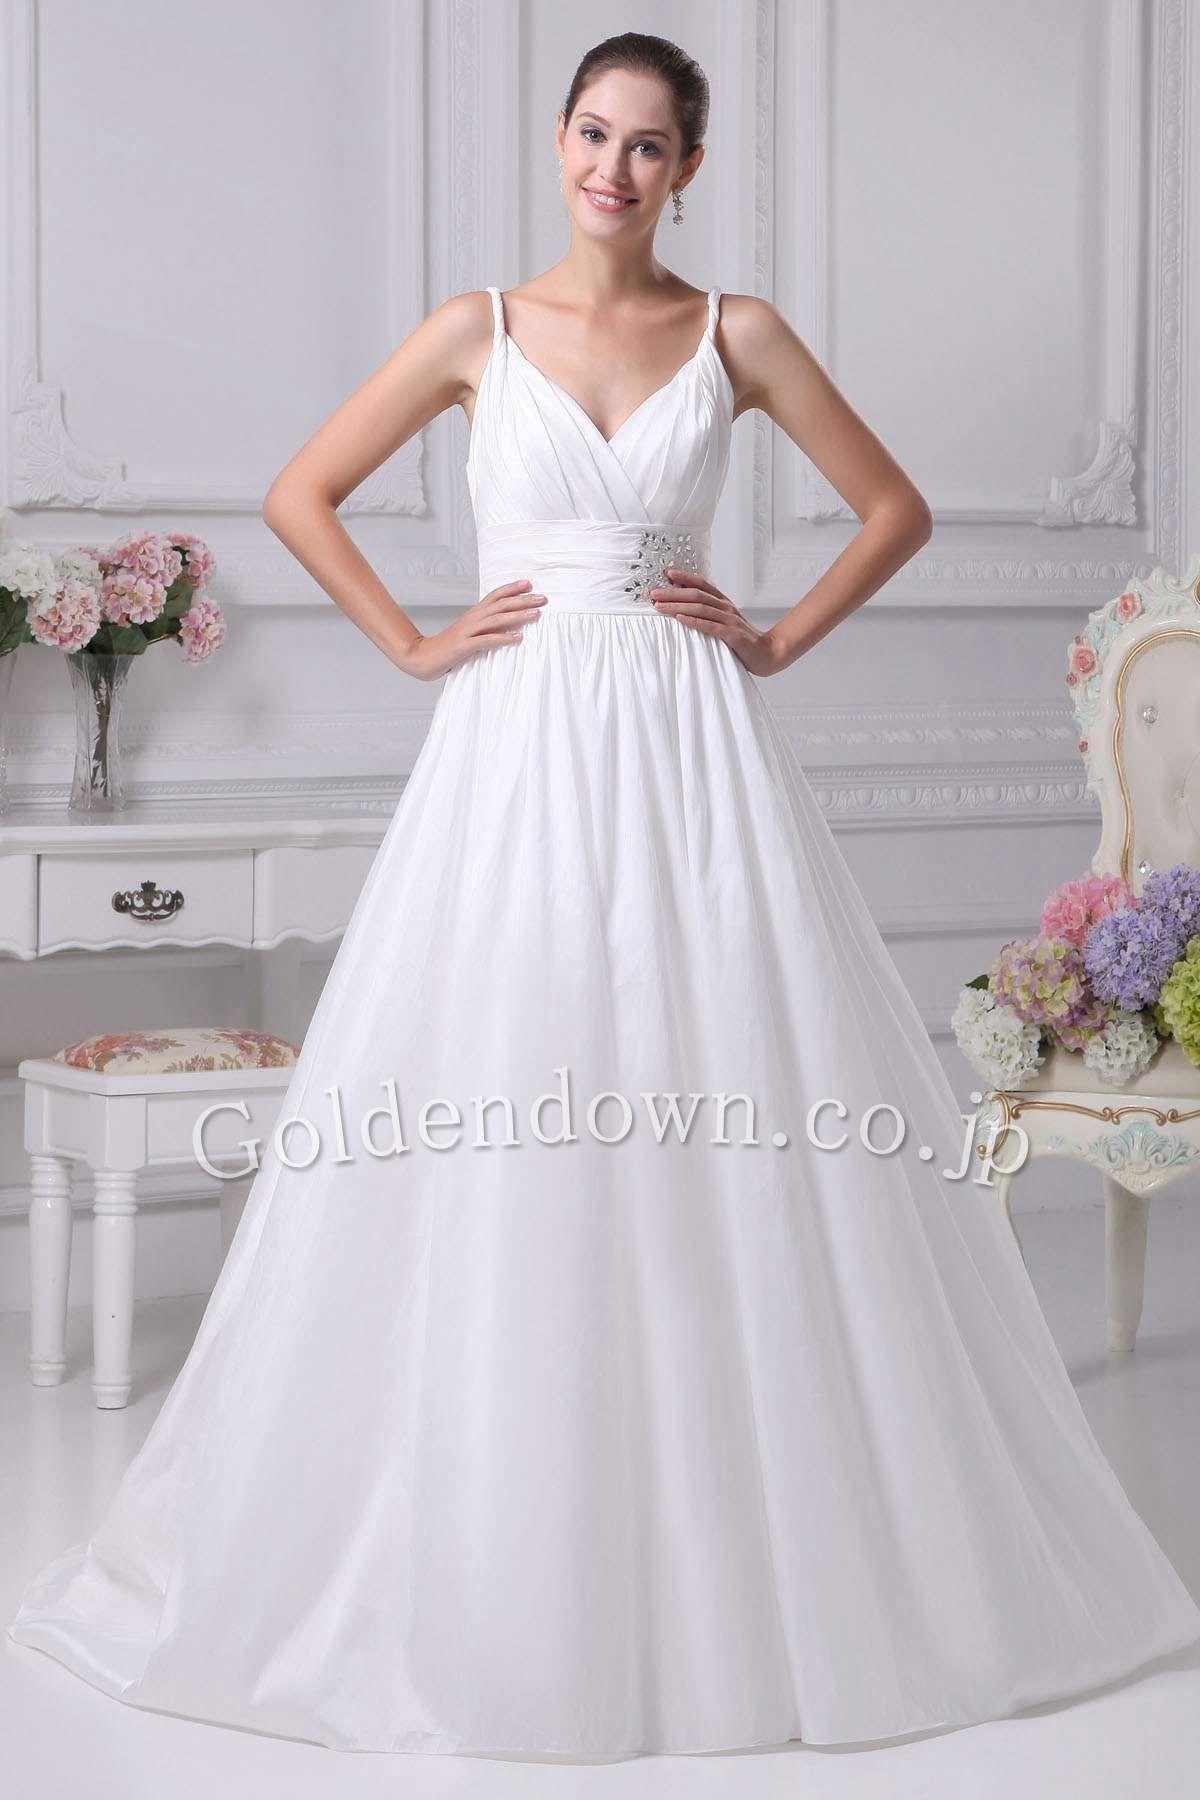 0a7cedb3acba4 ウエディングドレス Aライン フロア キャミソール サテン ホワイト(White) WD1001010035